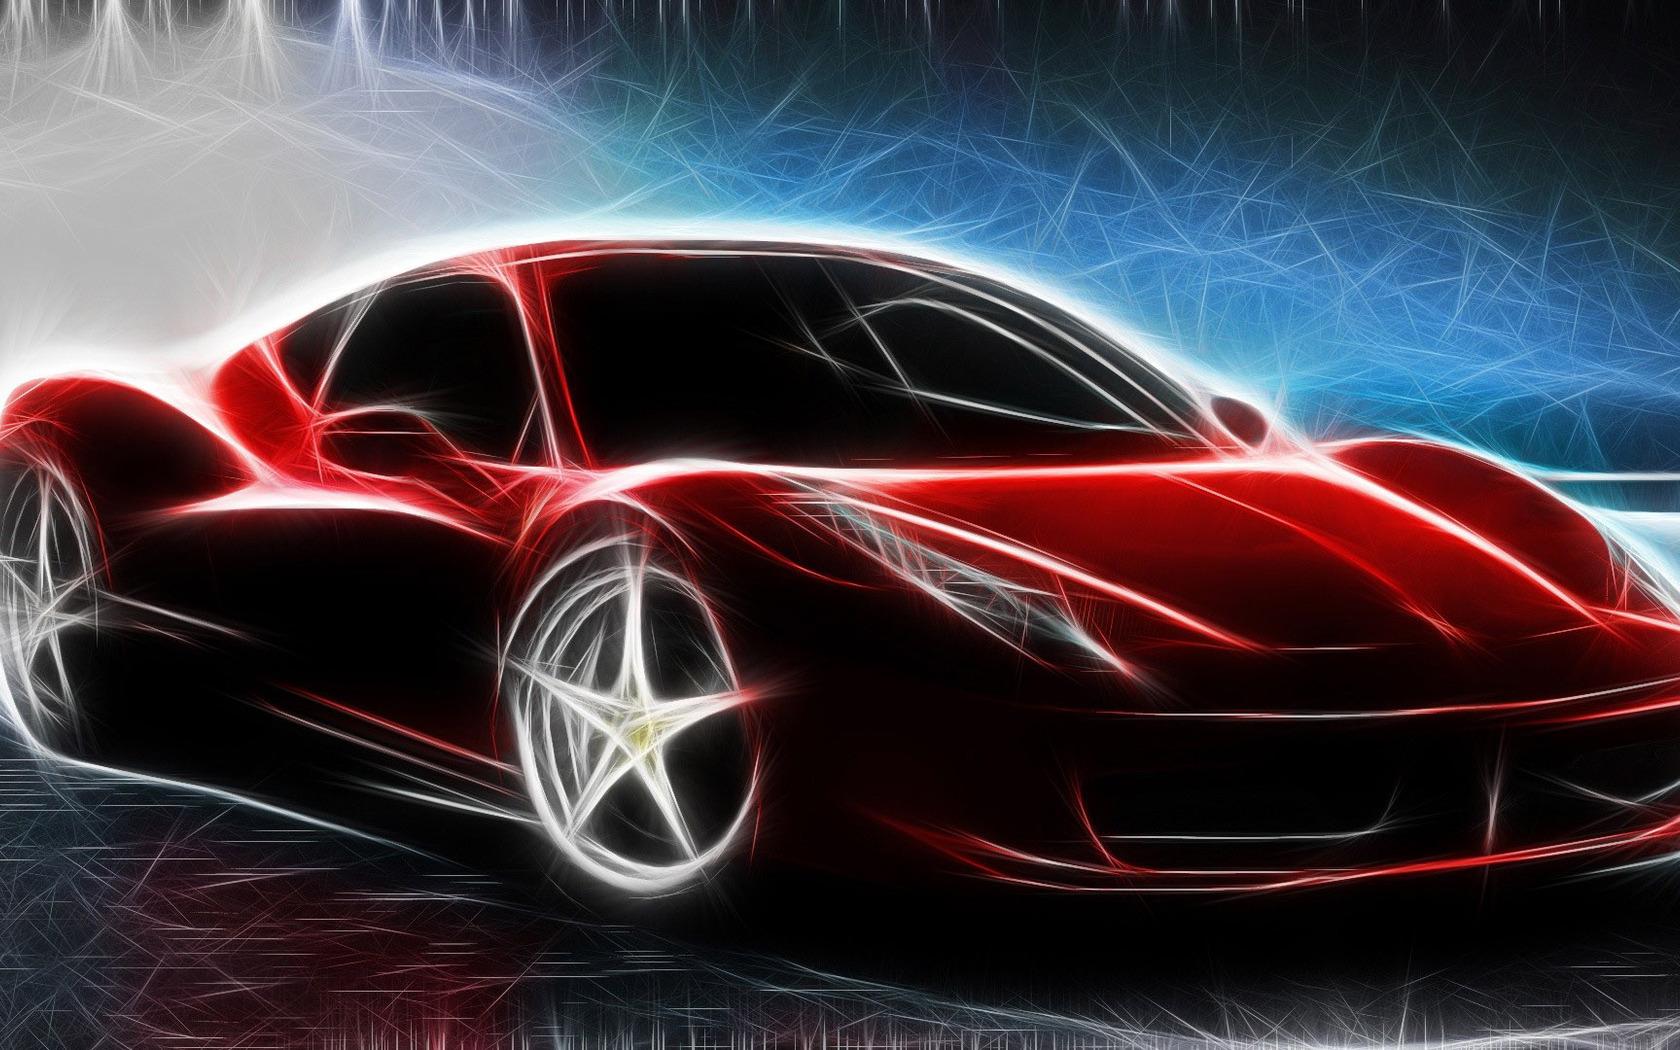 Ferrari 458 Italia wallpaper 10265 1680x1050